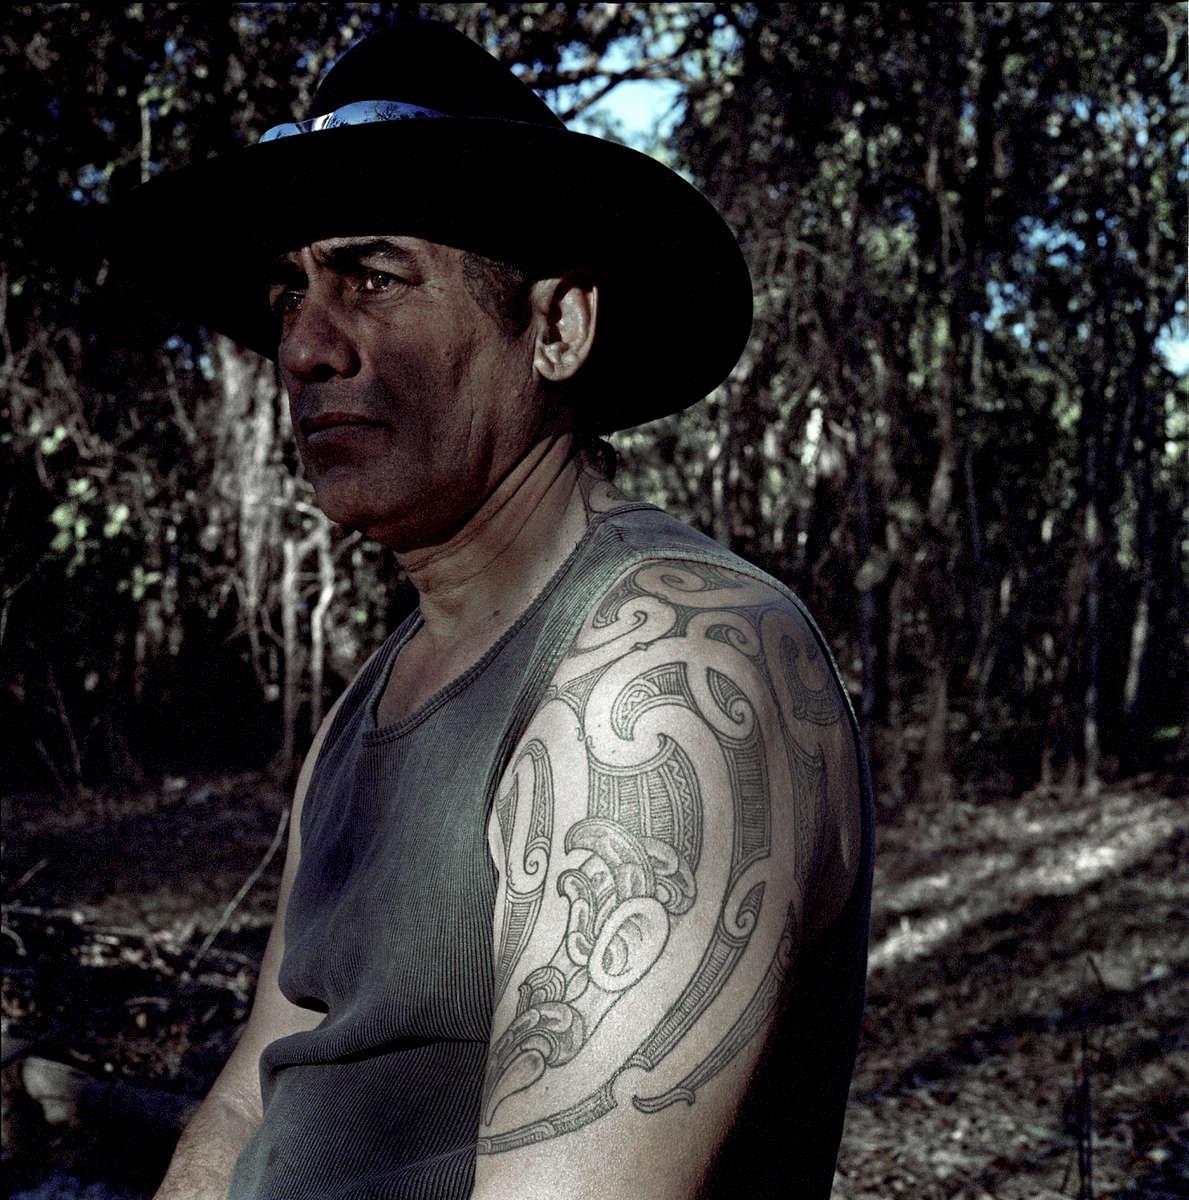 Portrait de Michael Karaitaine avec son tatouage maori (tribu des Tuwharetoas, Nouvelle Zélande). Umpty Doo, Darwin, TN, Australie, Juillet 2013.